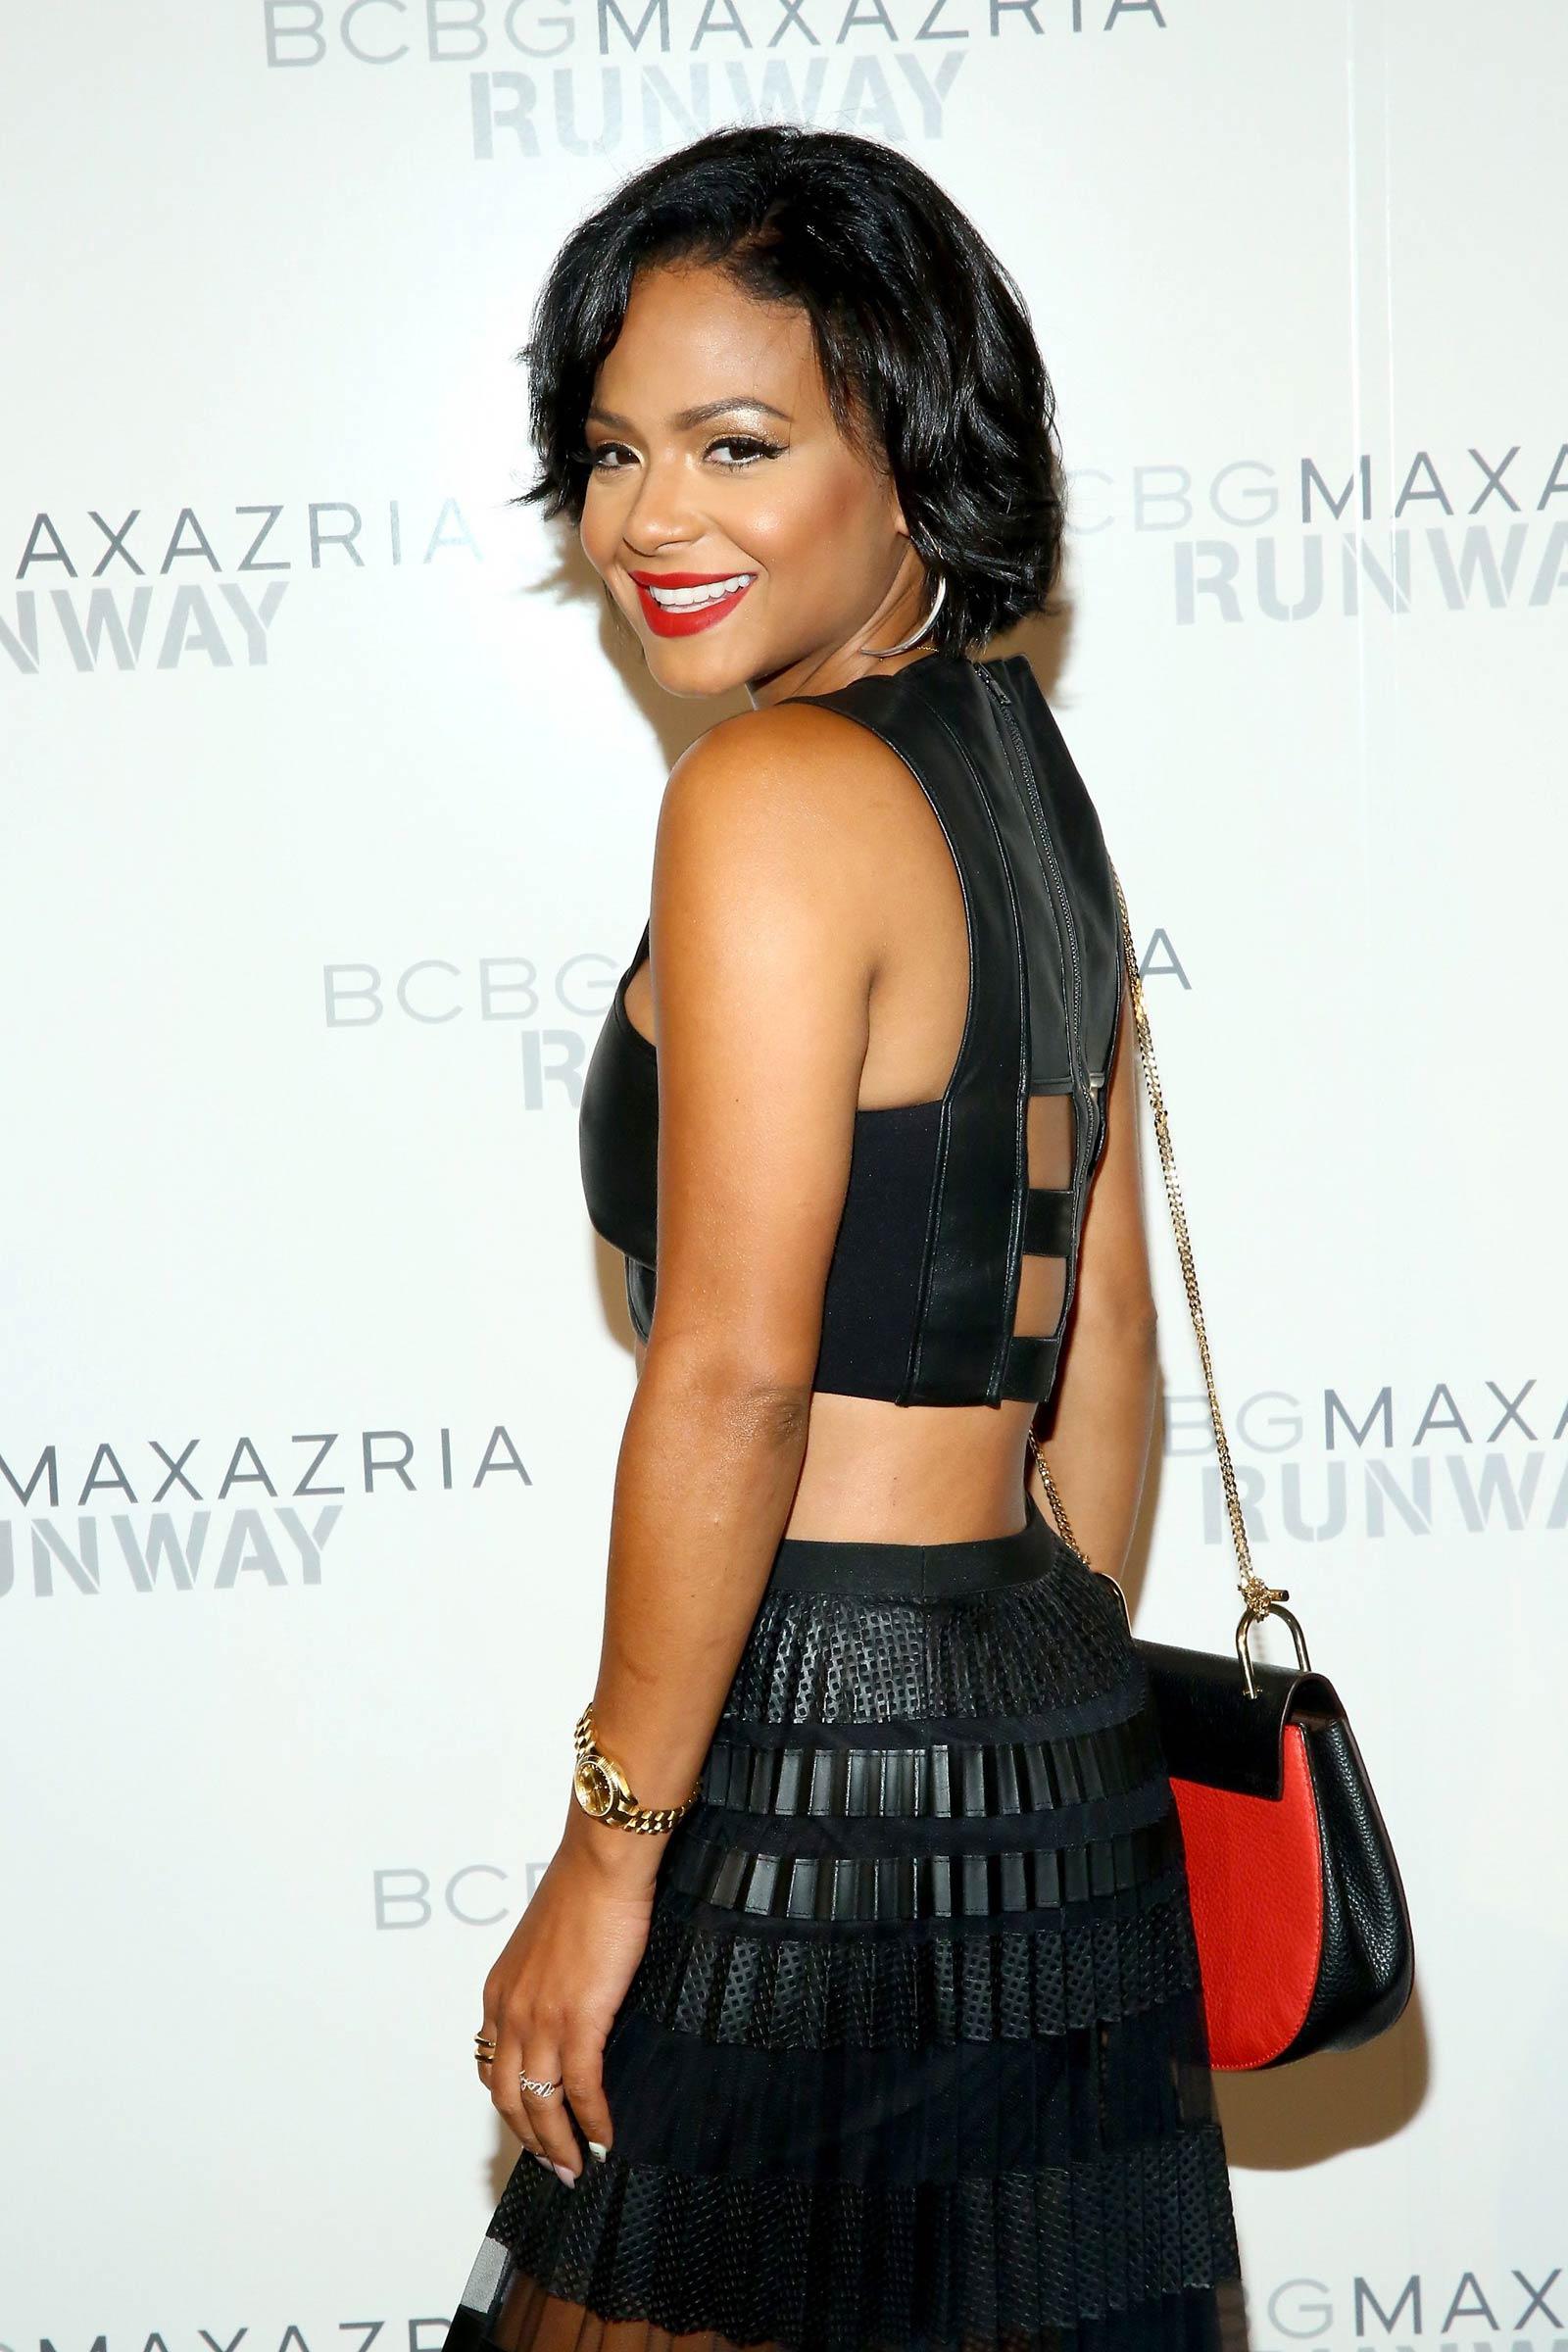 Christina Milian attends BCBGMAXAZRIA fashion show